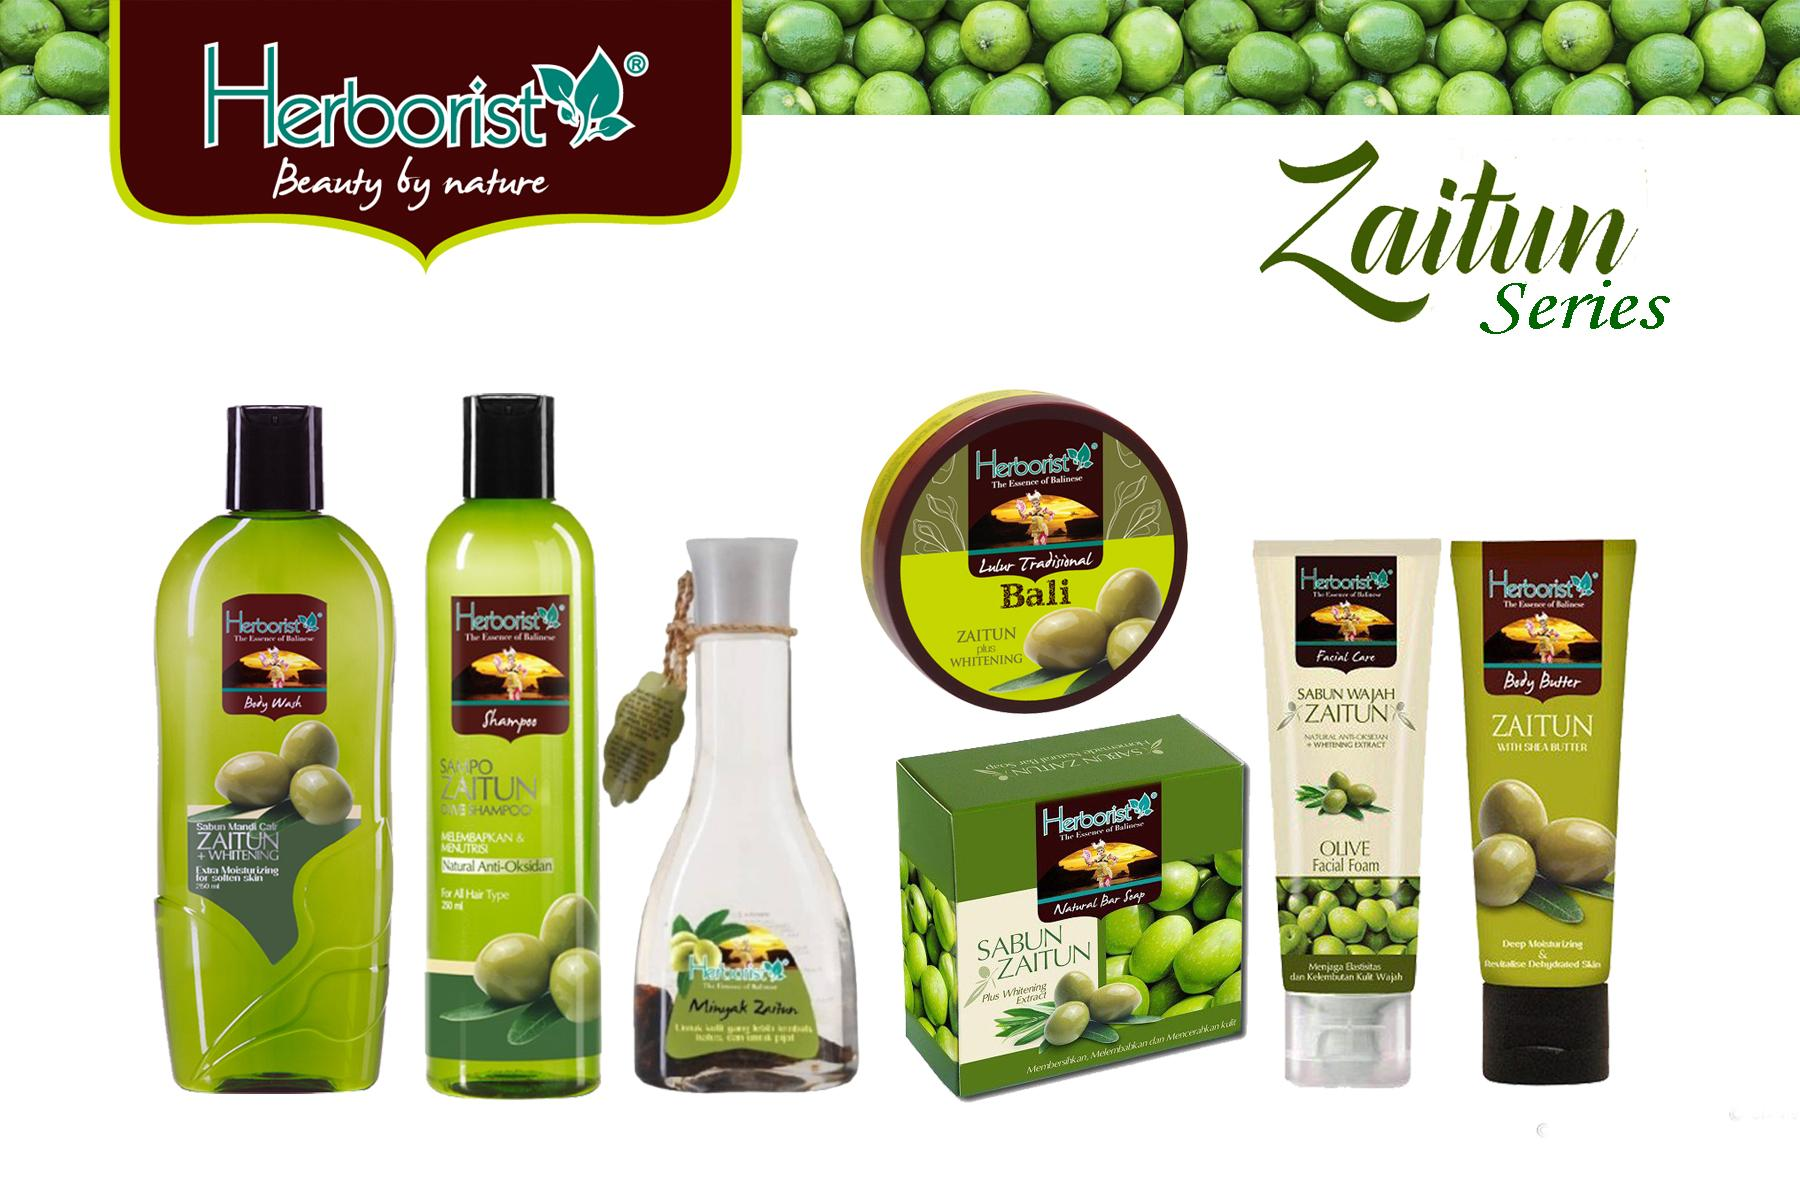 Paket Hadiah Bingkisan Alat Mandi Tubuh Lazada Perlengkapan Sabun Haji Umroh Shirin Kecil Herborist Zaitun Komplit 7 Pcs